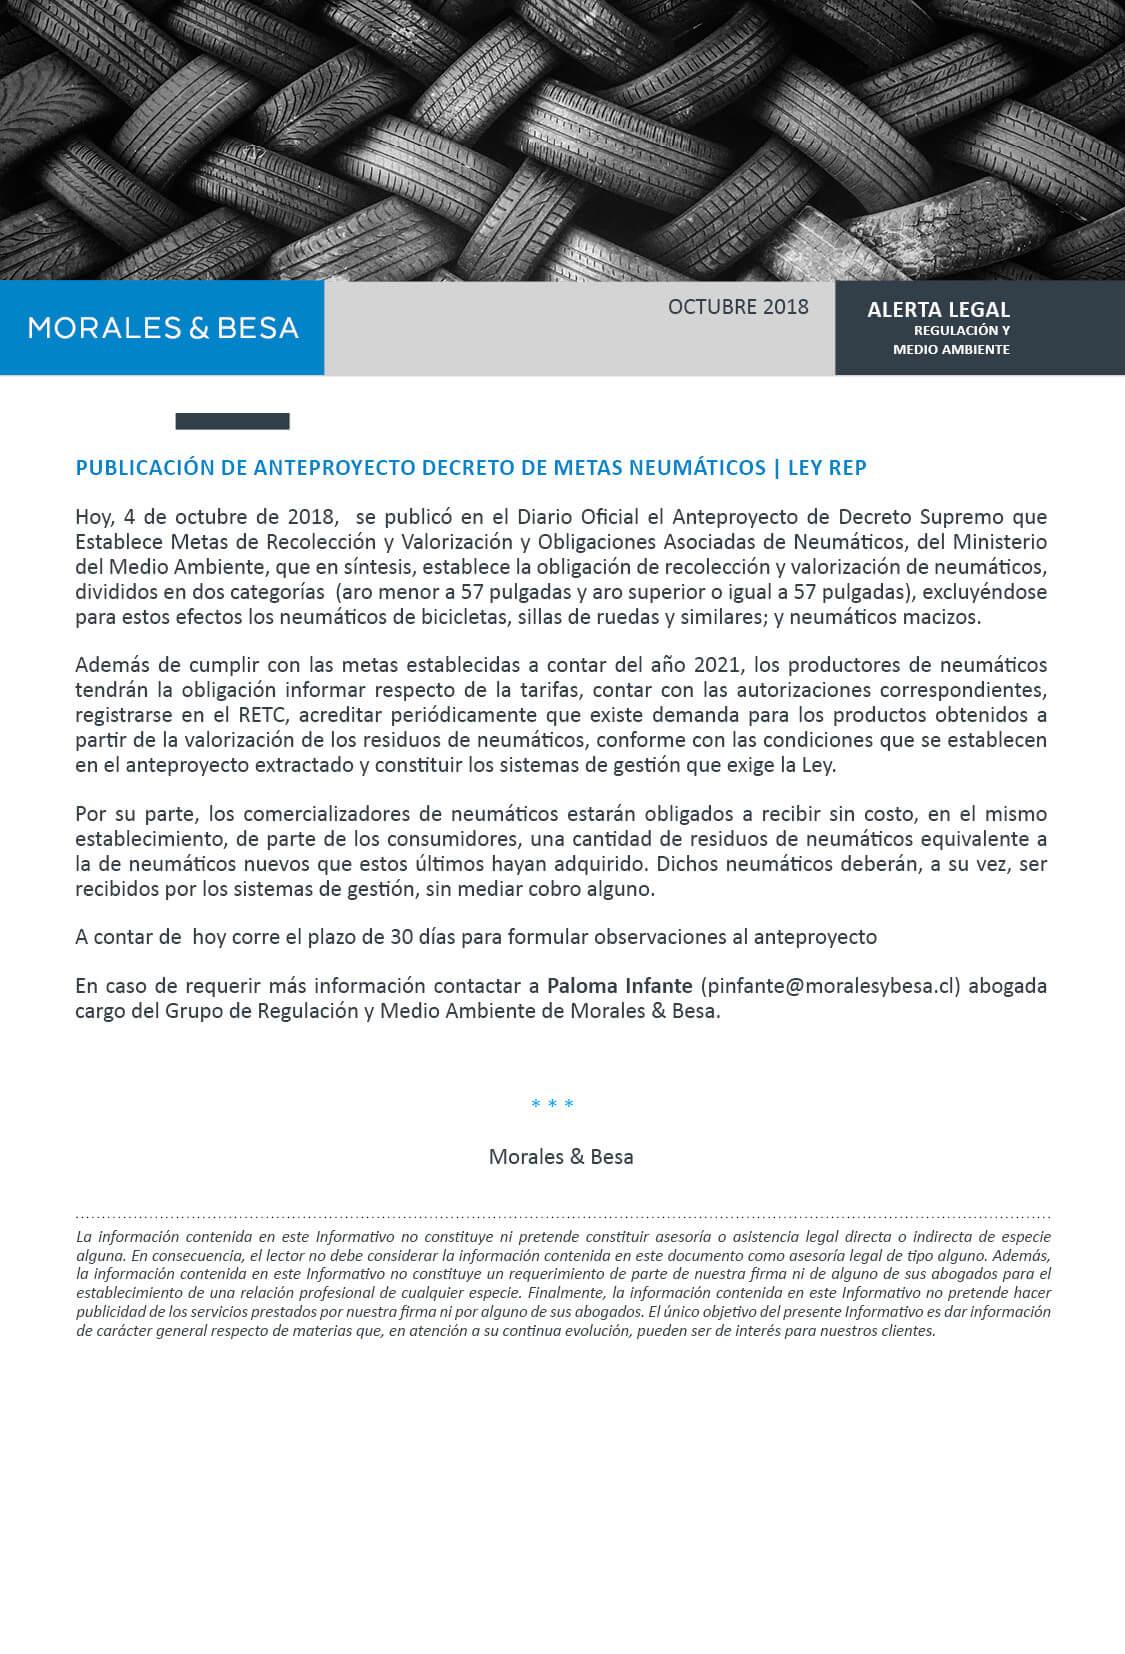 Morales & Besa_Alerta Legal_Regulatorio_Octubre 2018